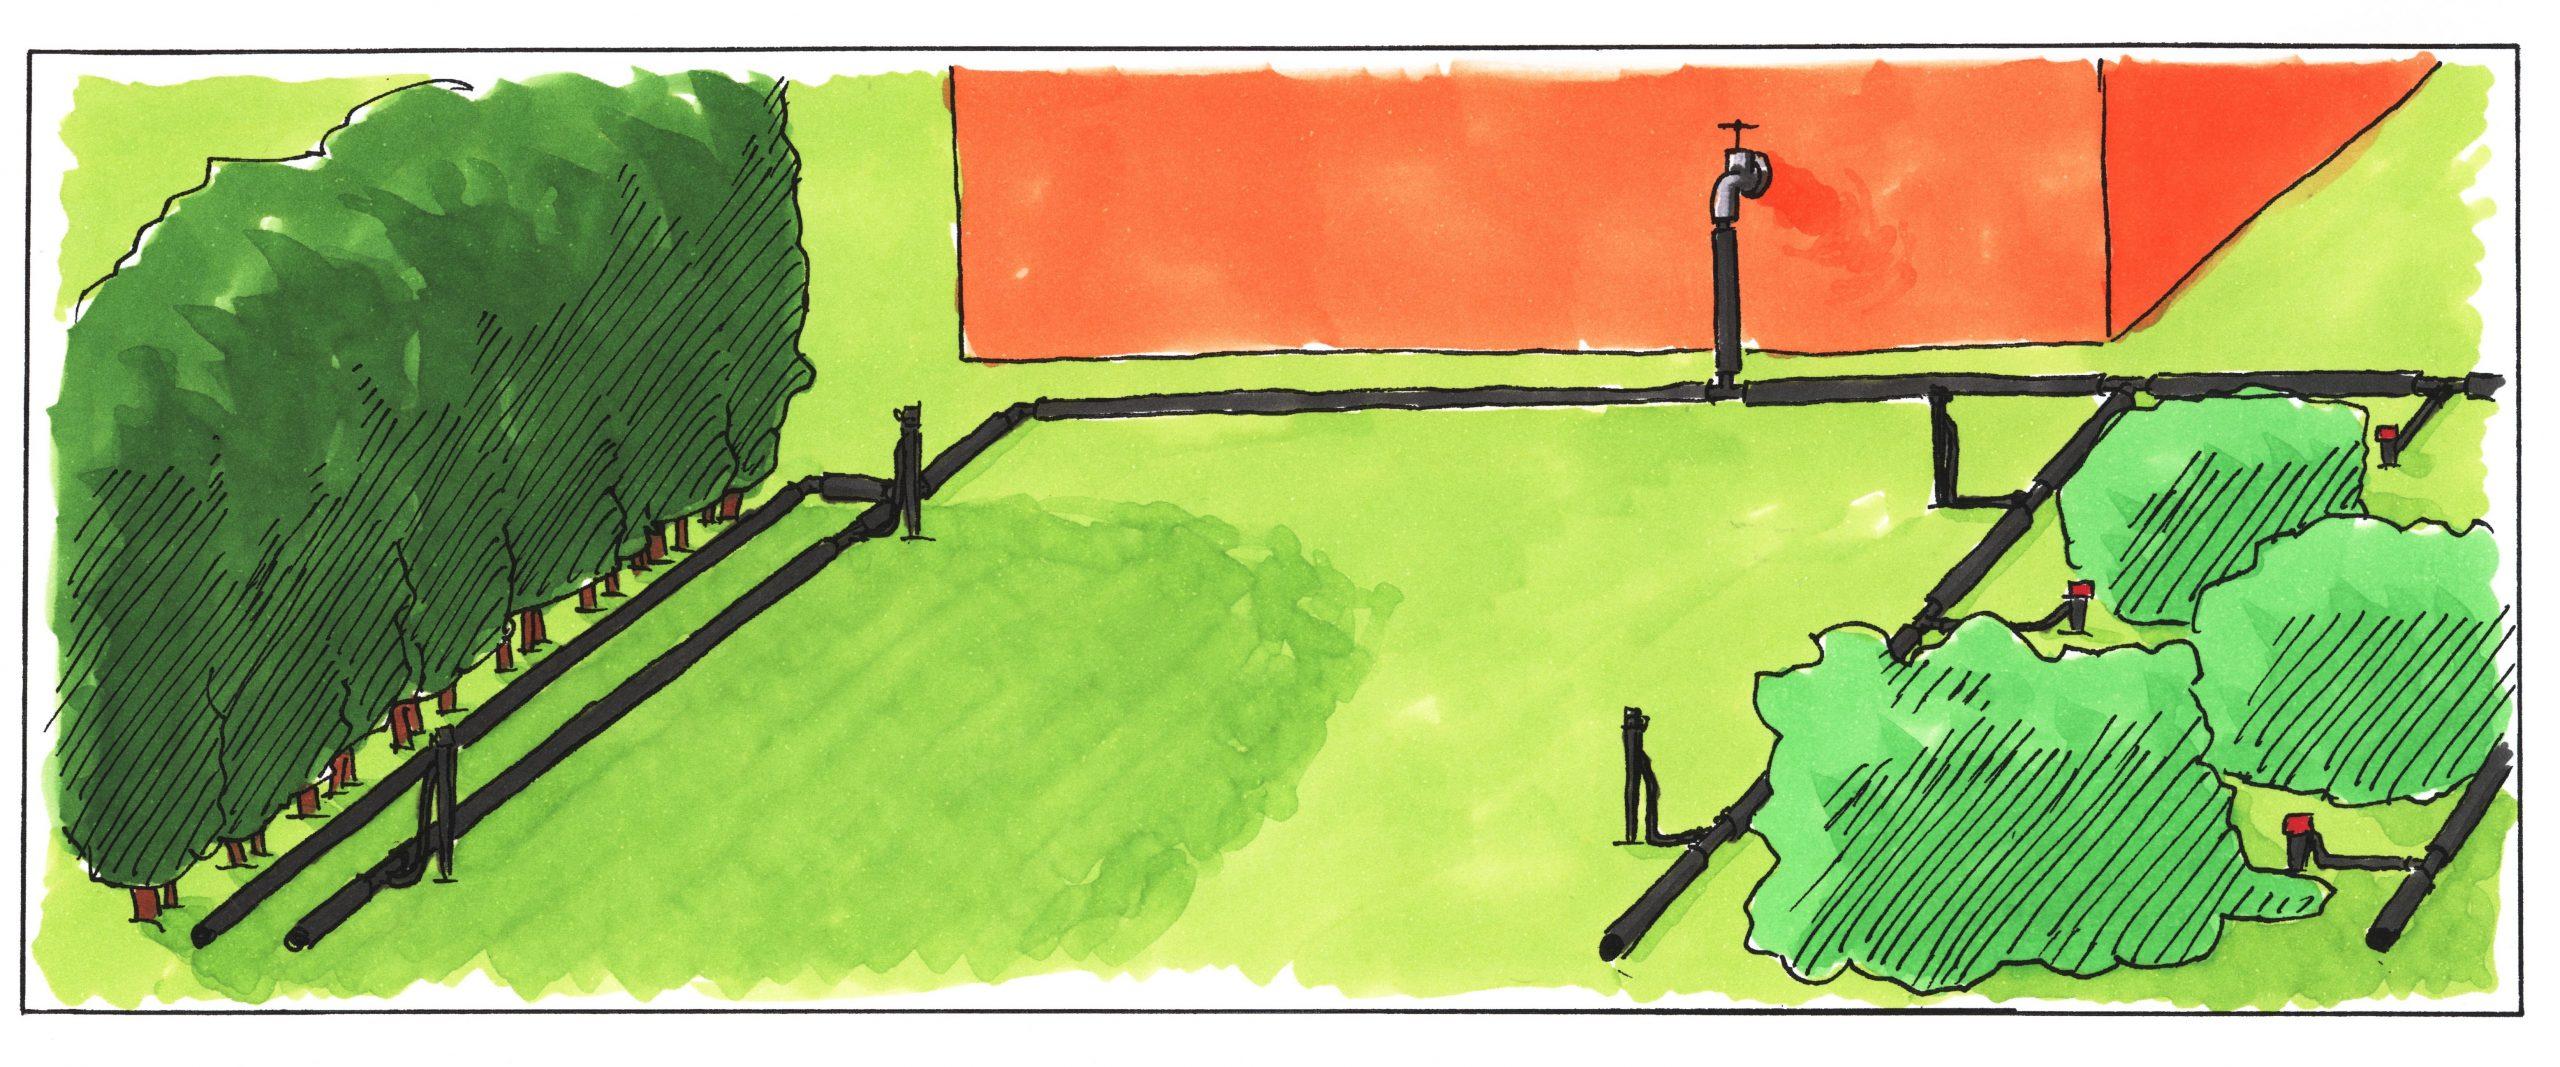 Full Size of Hängesessel Garten Ecksofa Whirlpool Aufblasbar Pavillon überdachung Bewässerungssystem Bewässerung Relaxsessel Feuerstelle Sichtschutz Für Spielhaus Garten Bewässerung Garten